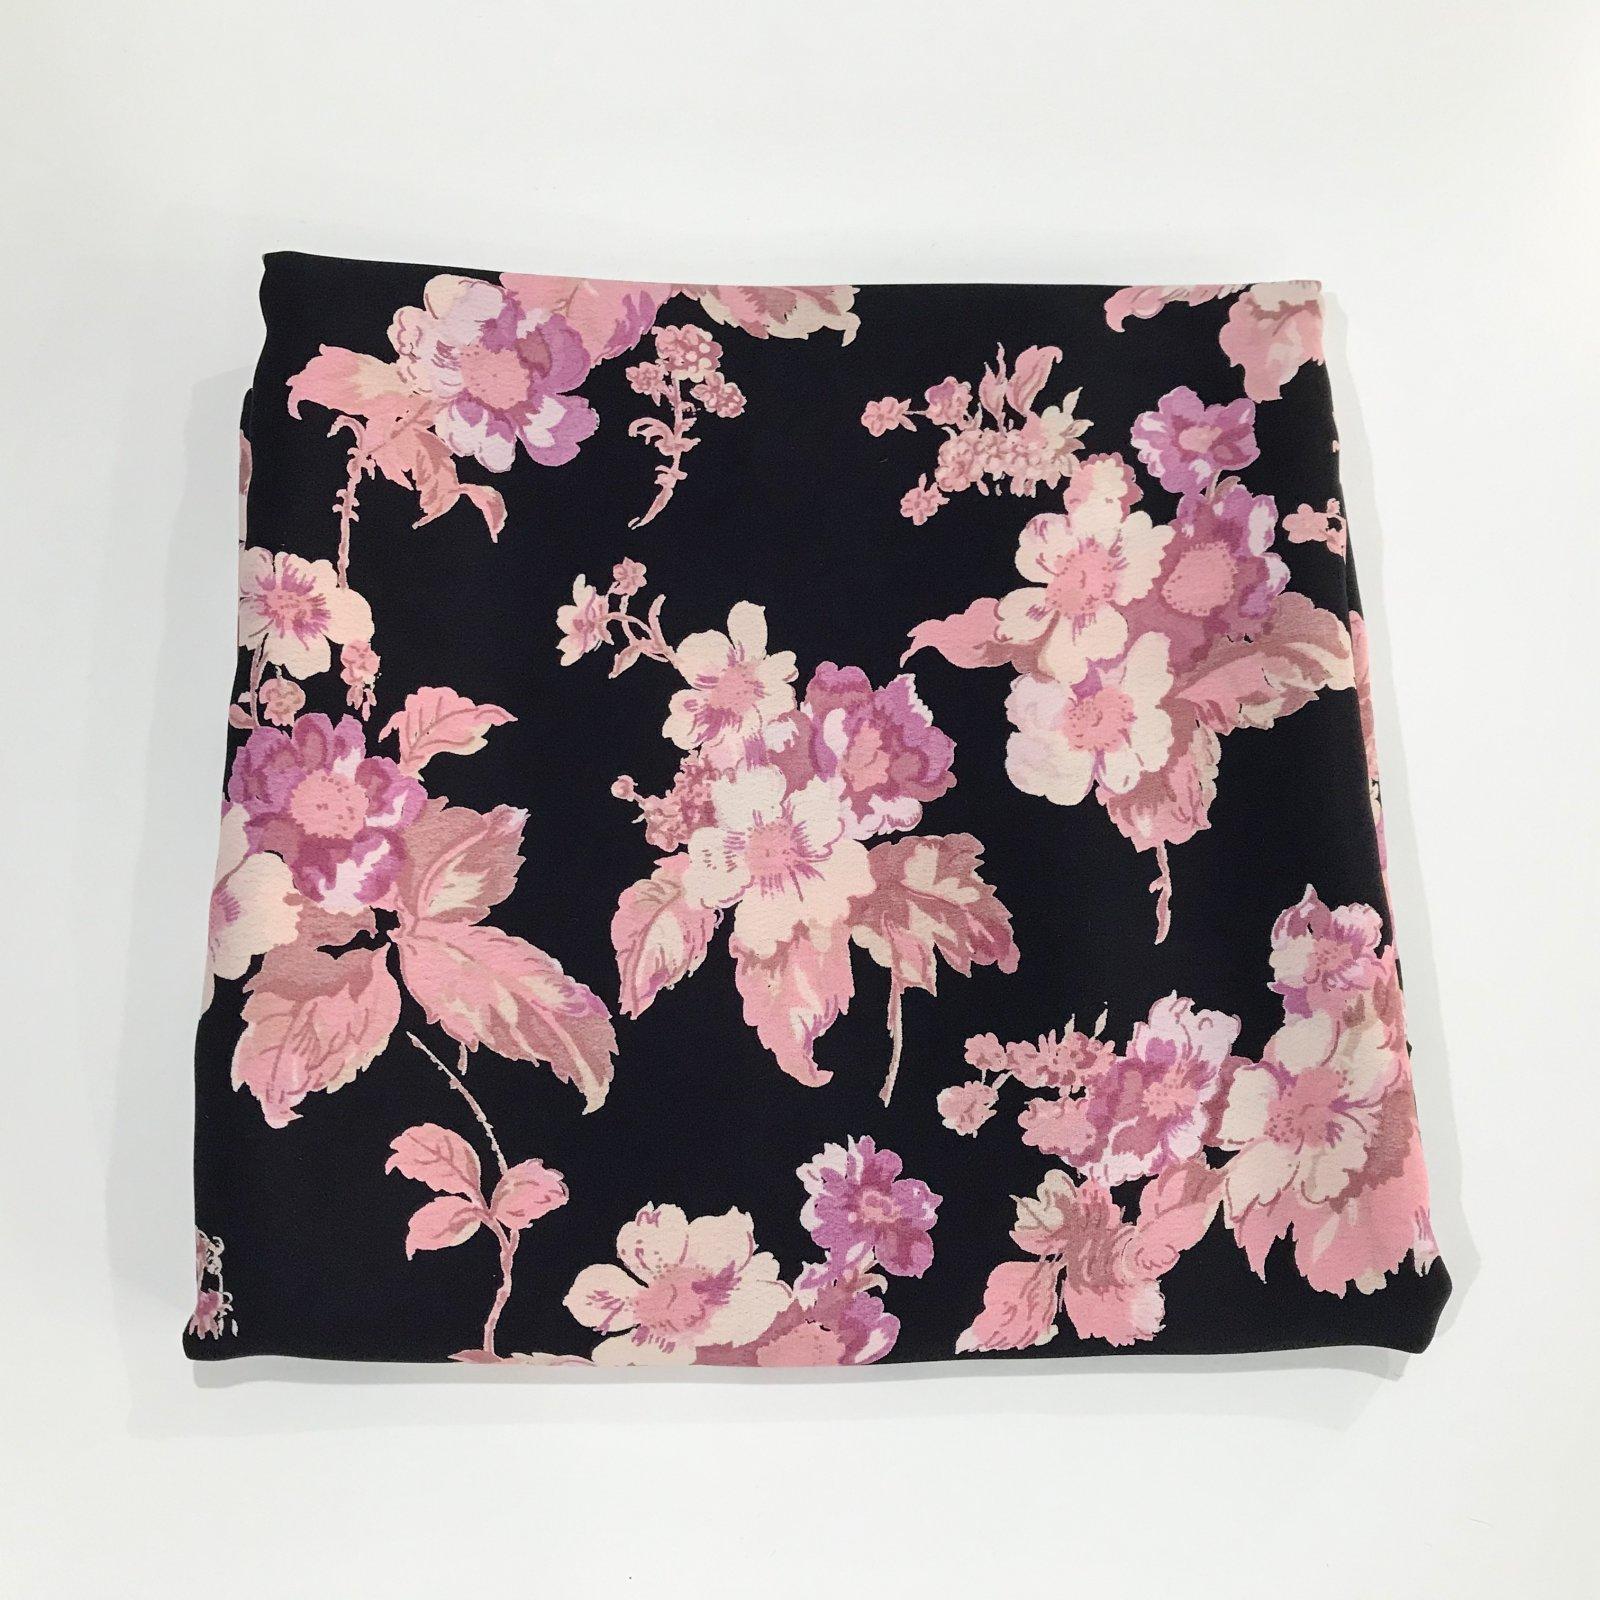 1 yard + 33 inches - Rayon - Blushing Dramatic Floral Crepe